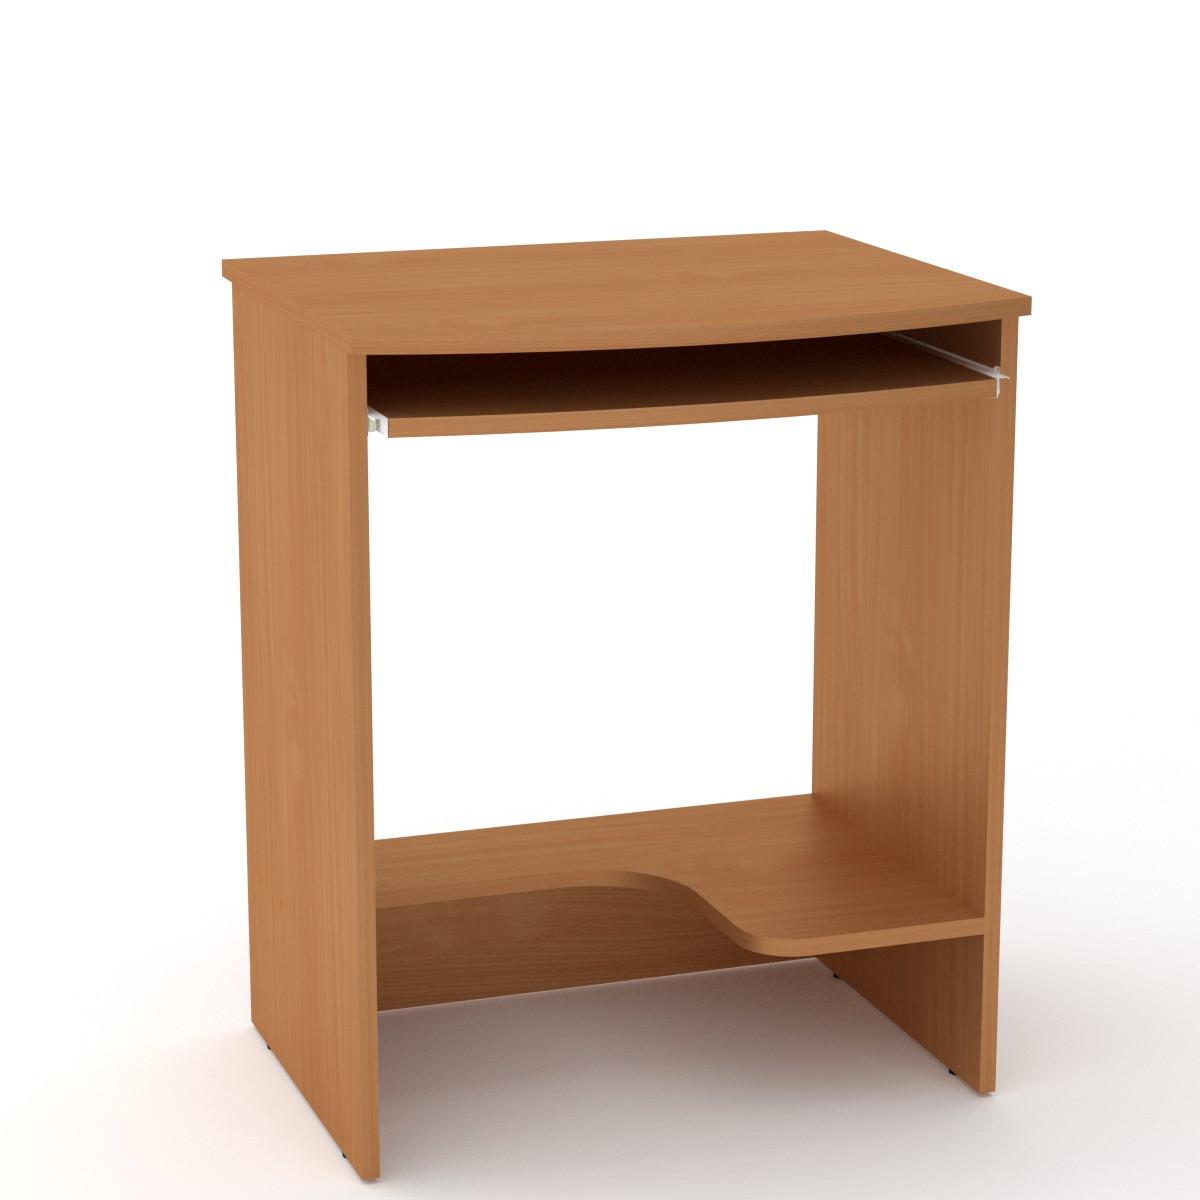 Стол компьютерный СКМ-13 бук Компанит (61х50х74 см)